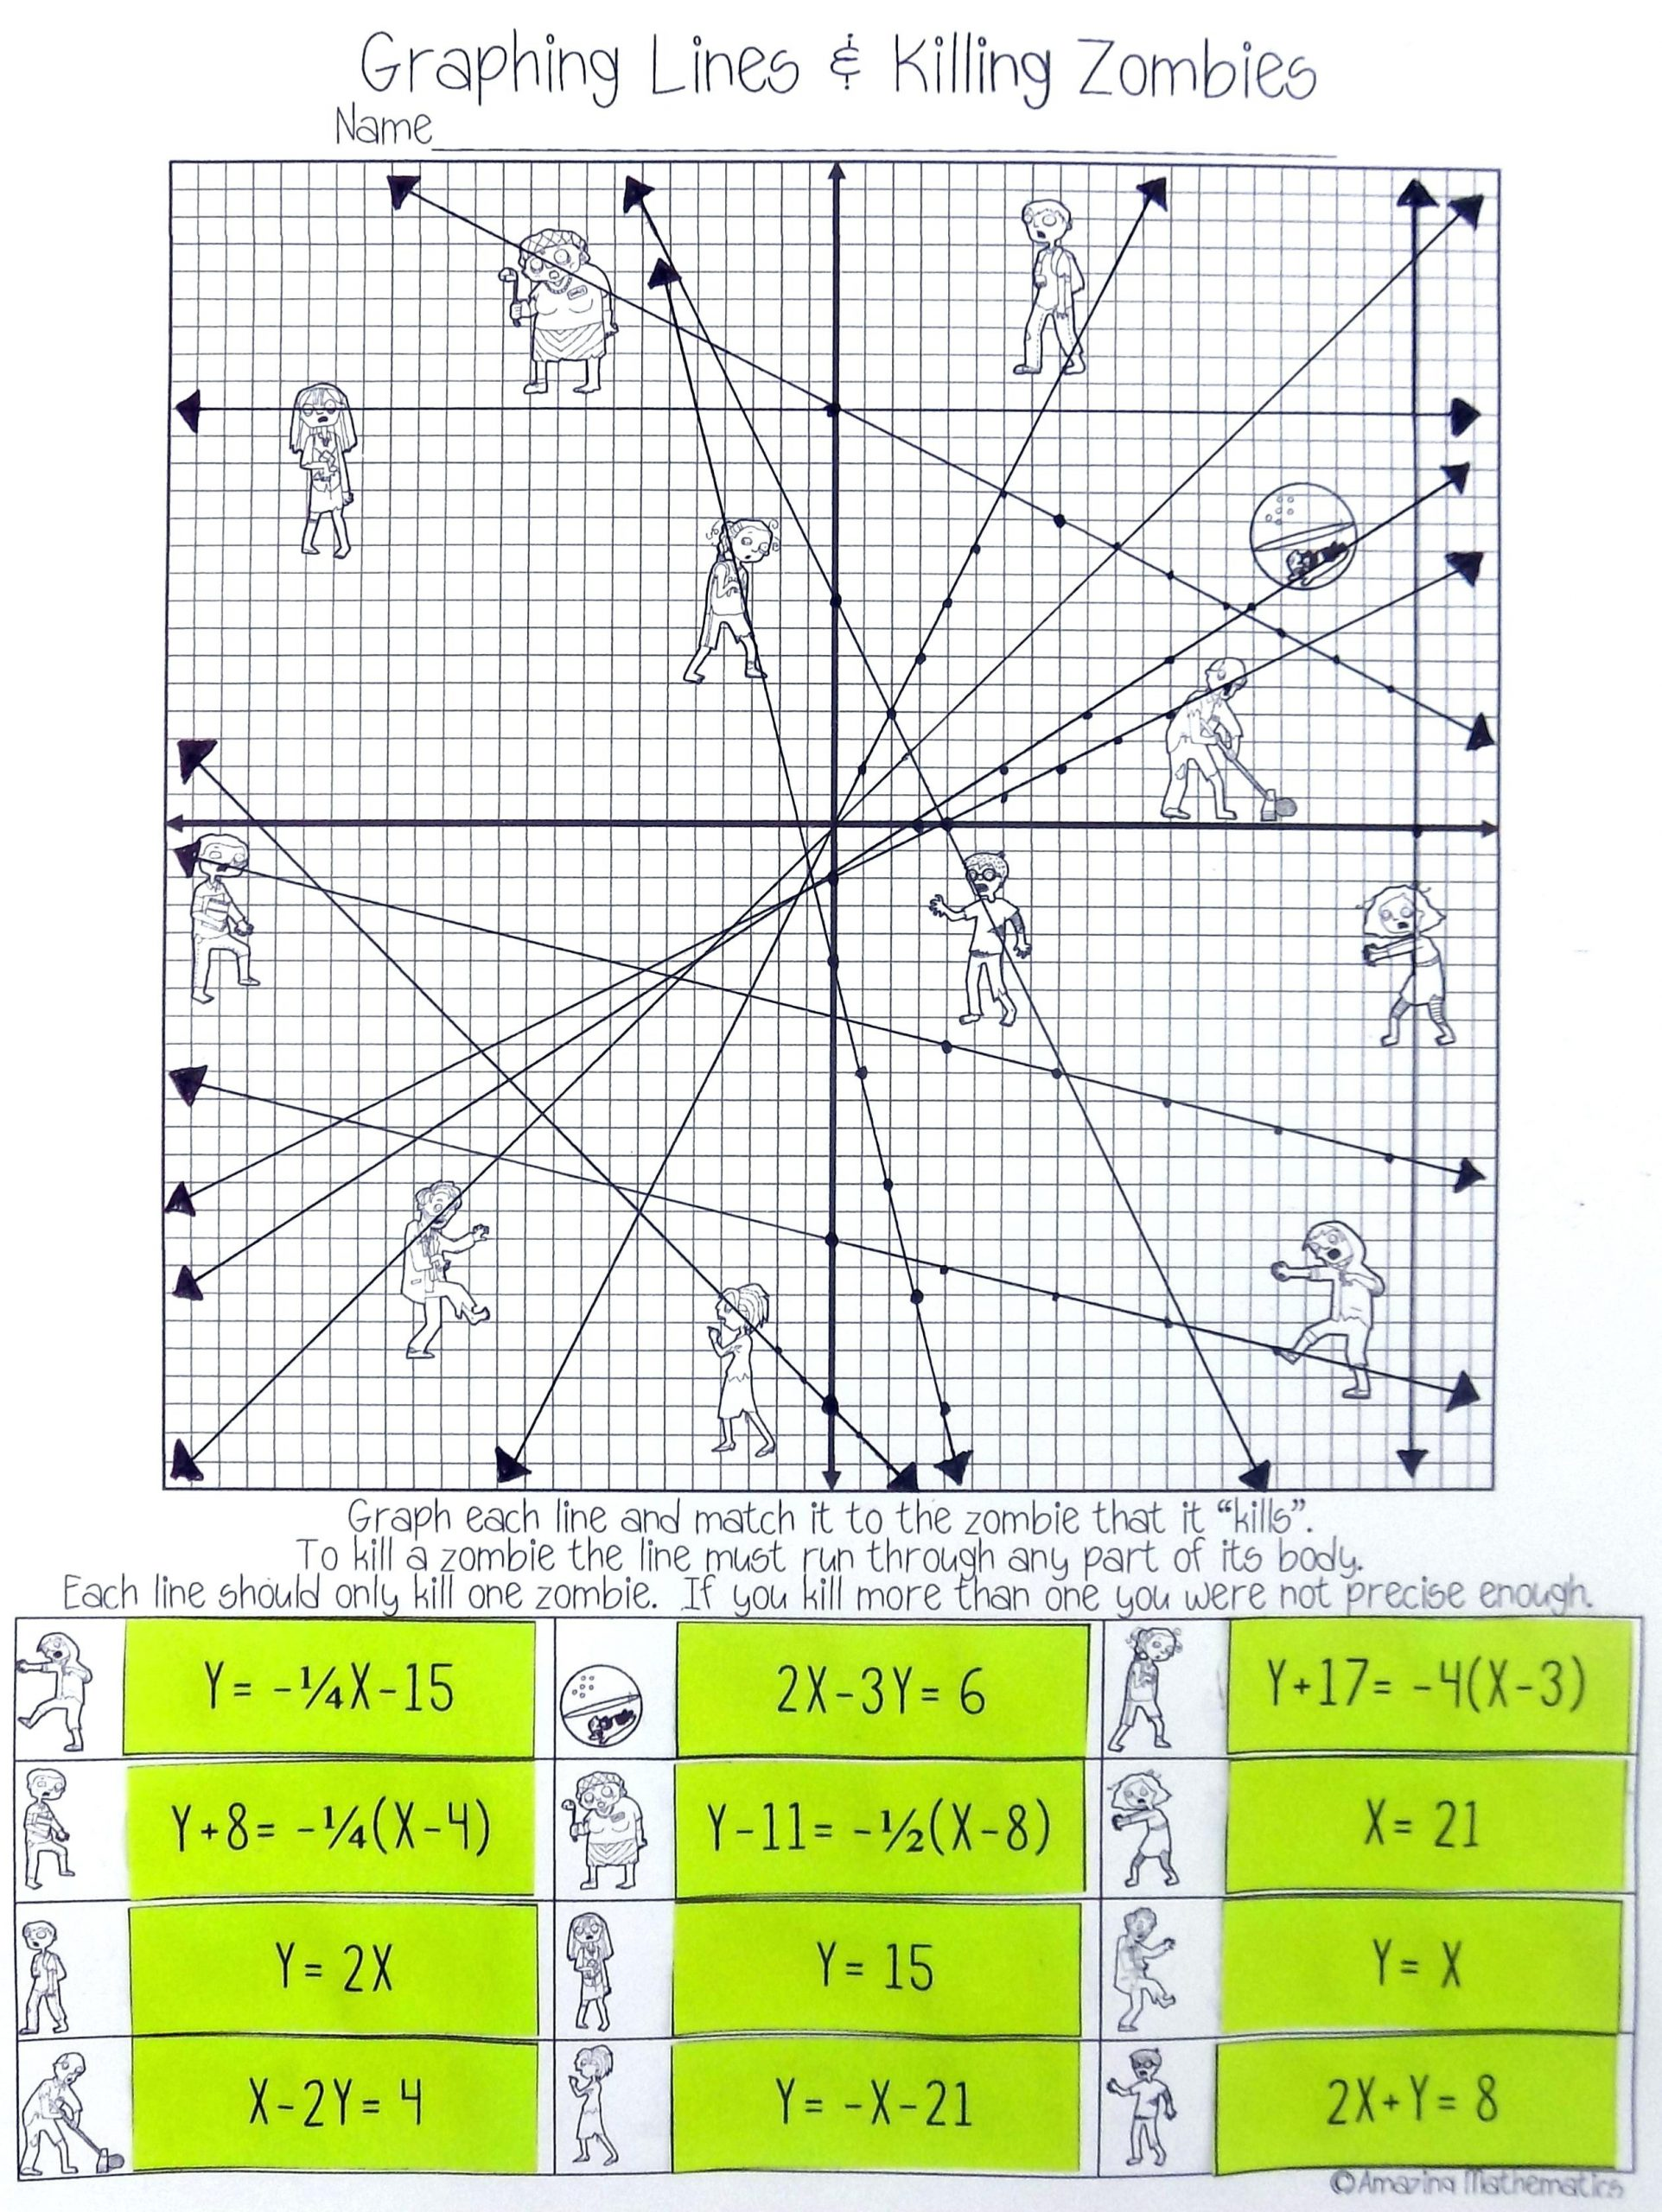 30 Interpreting Graphs Worksheet Answers